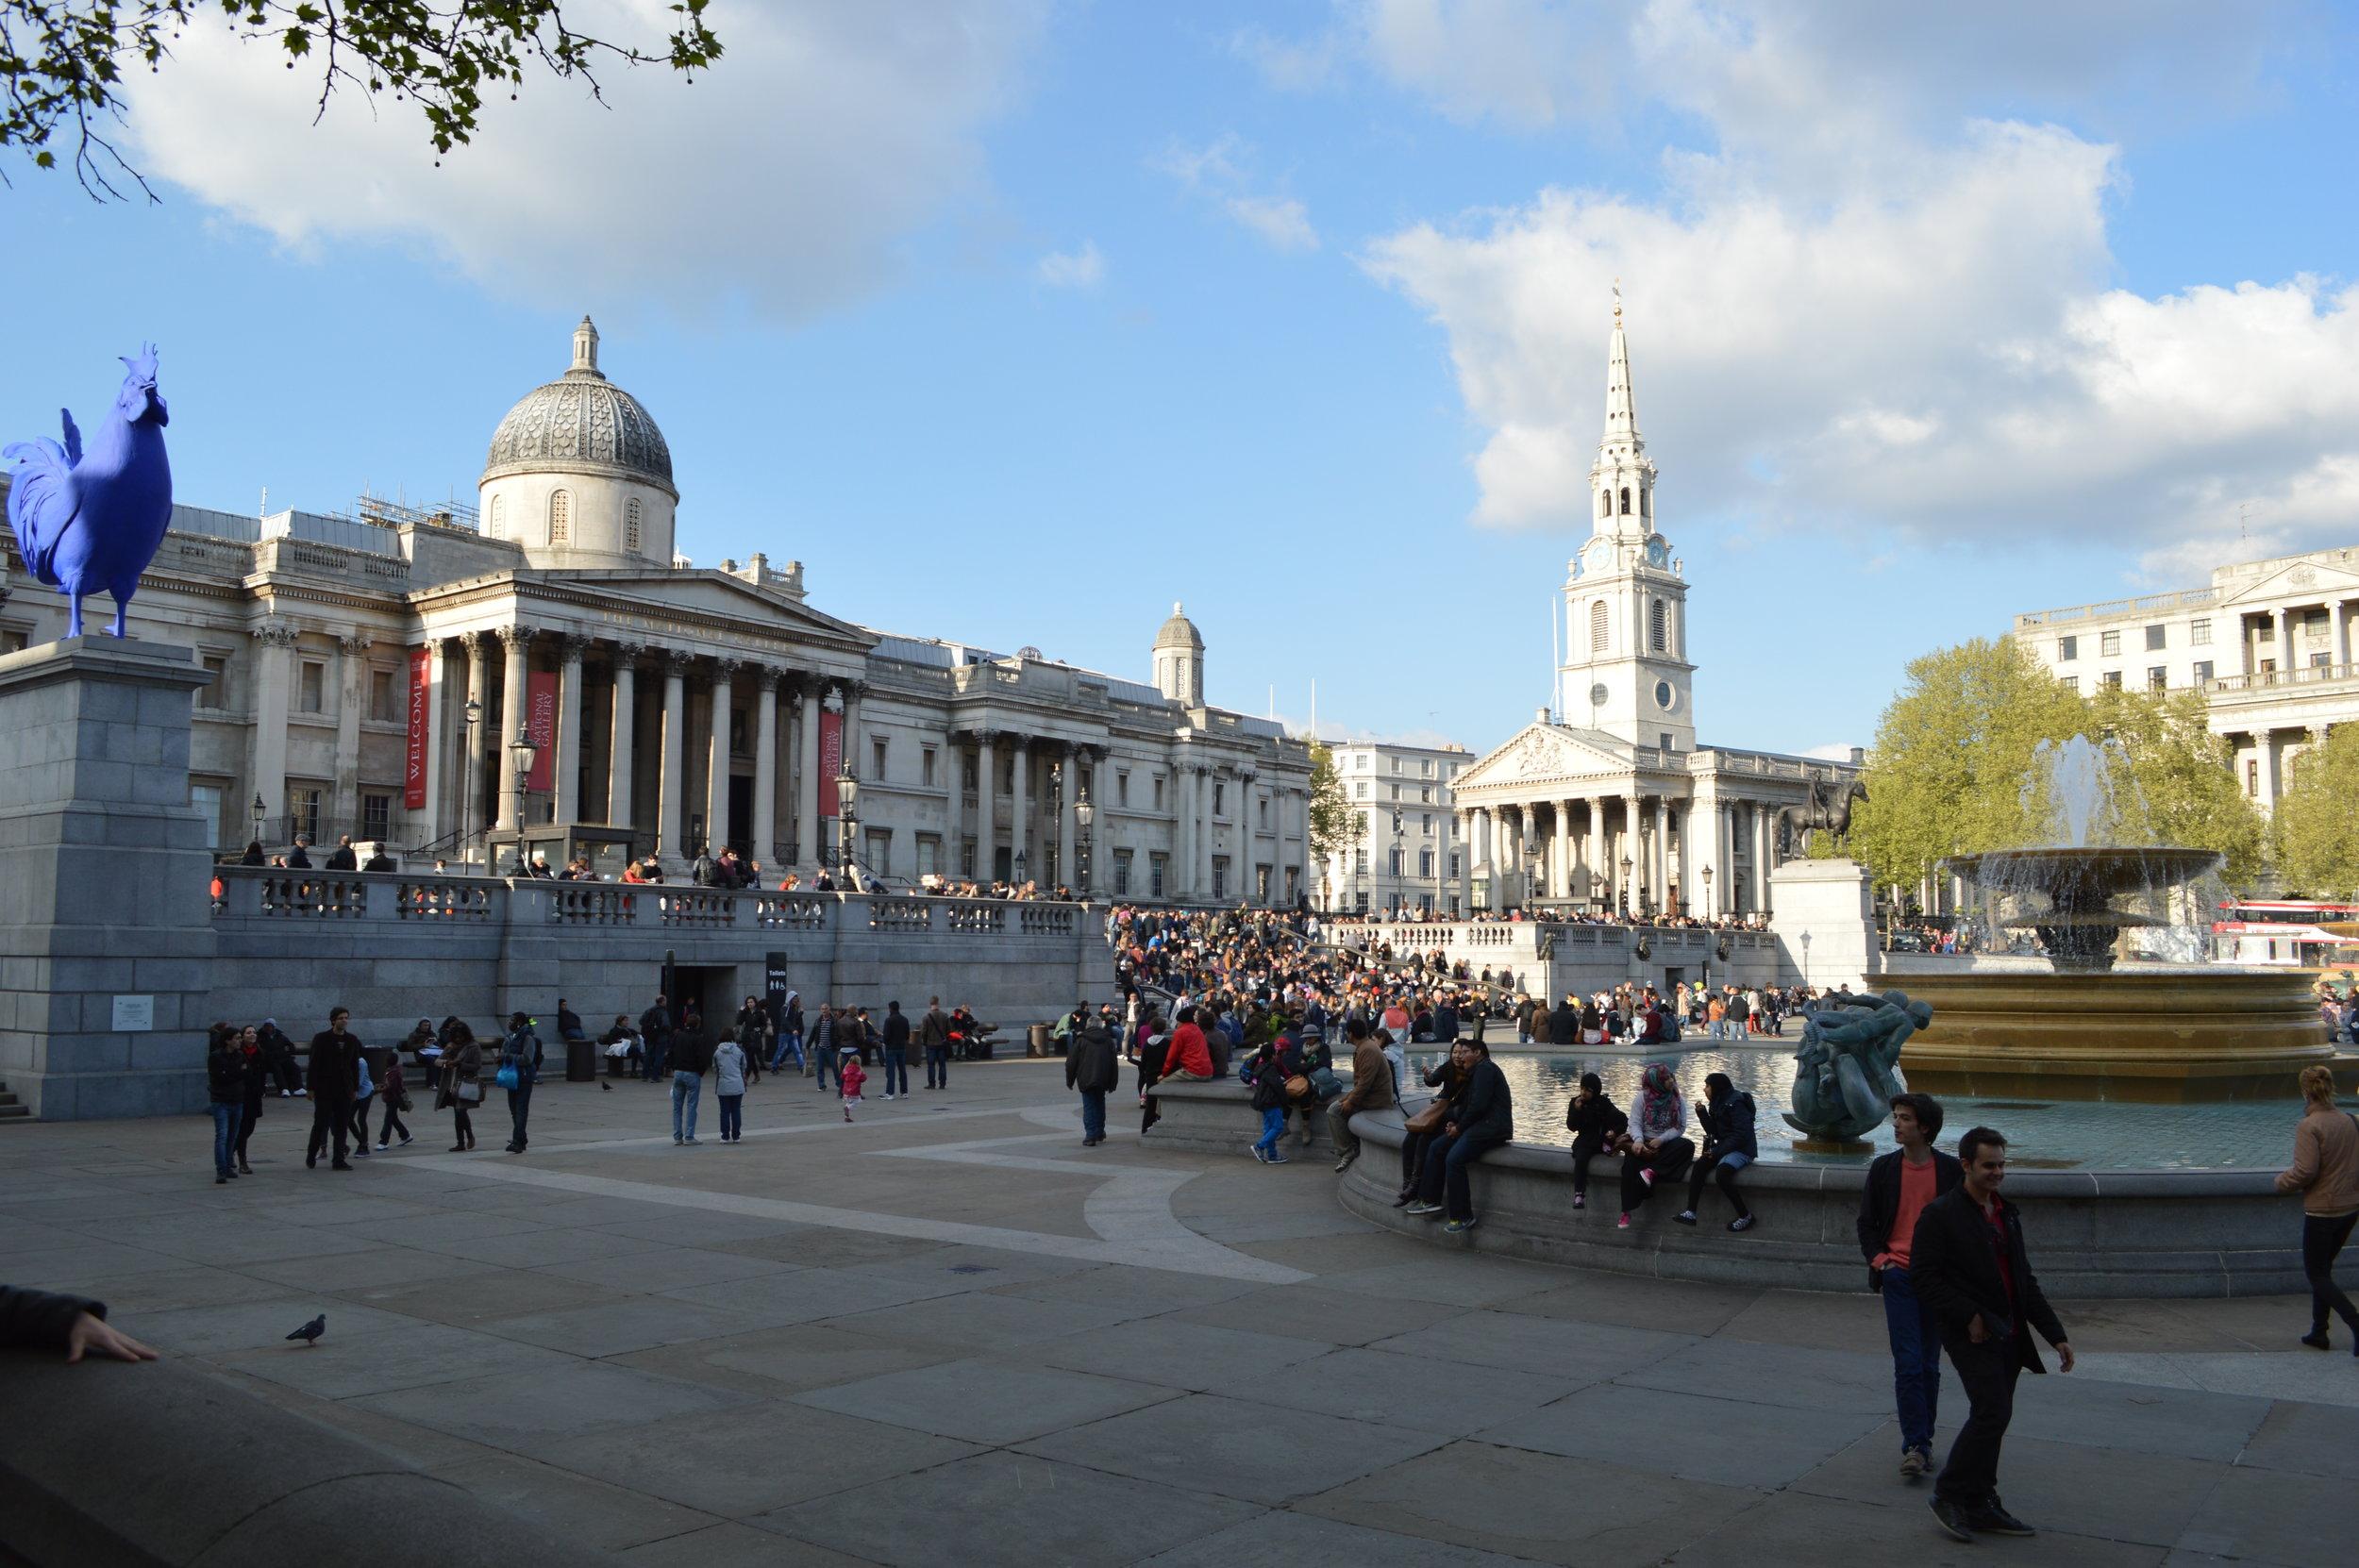 Trafalgar Square and National Gallery, London